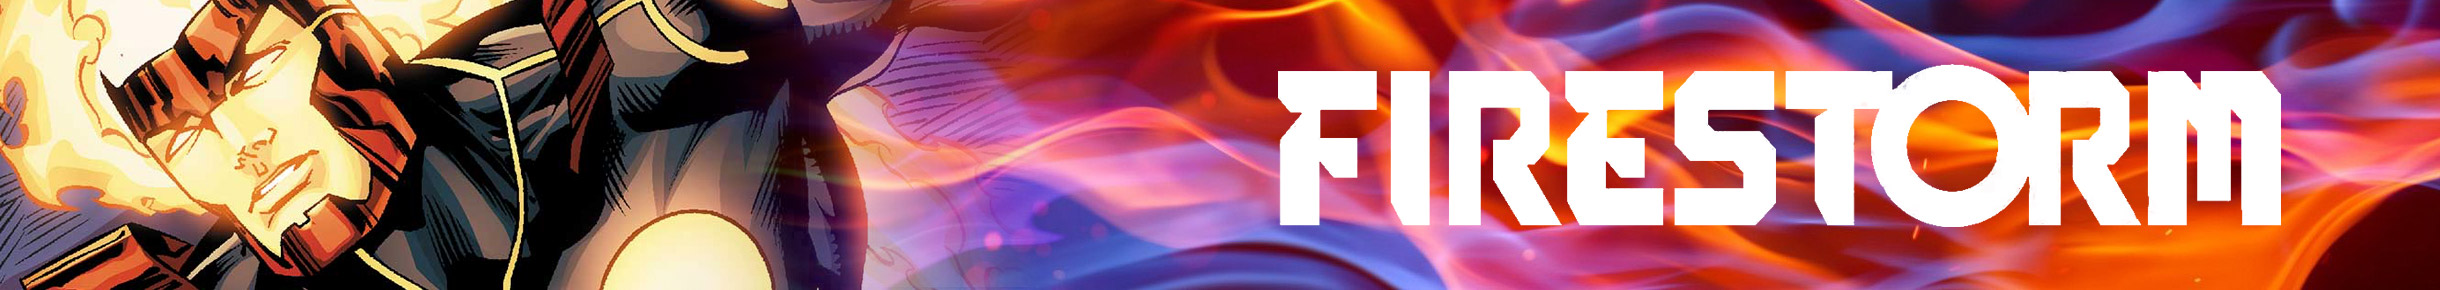 Firestorm Merchandise Banner